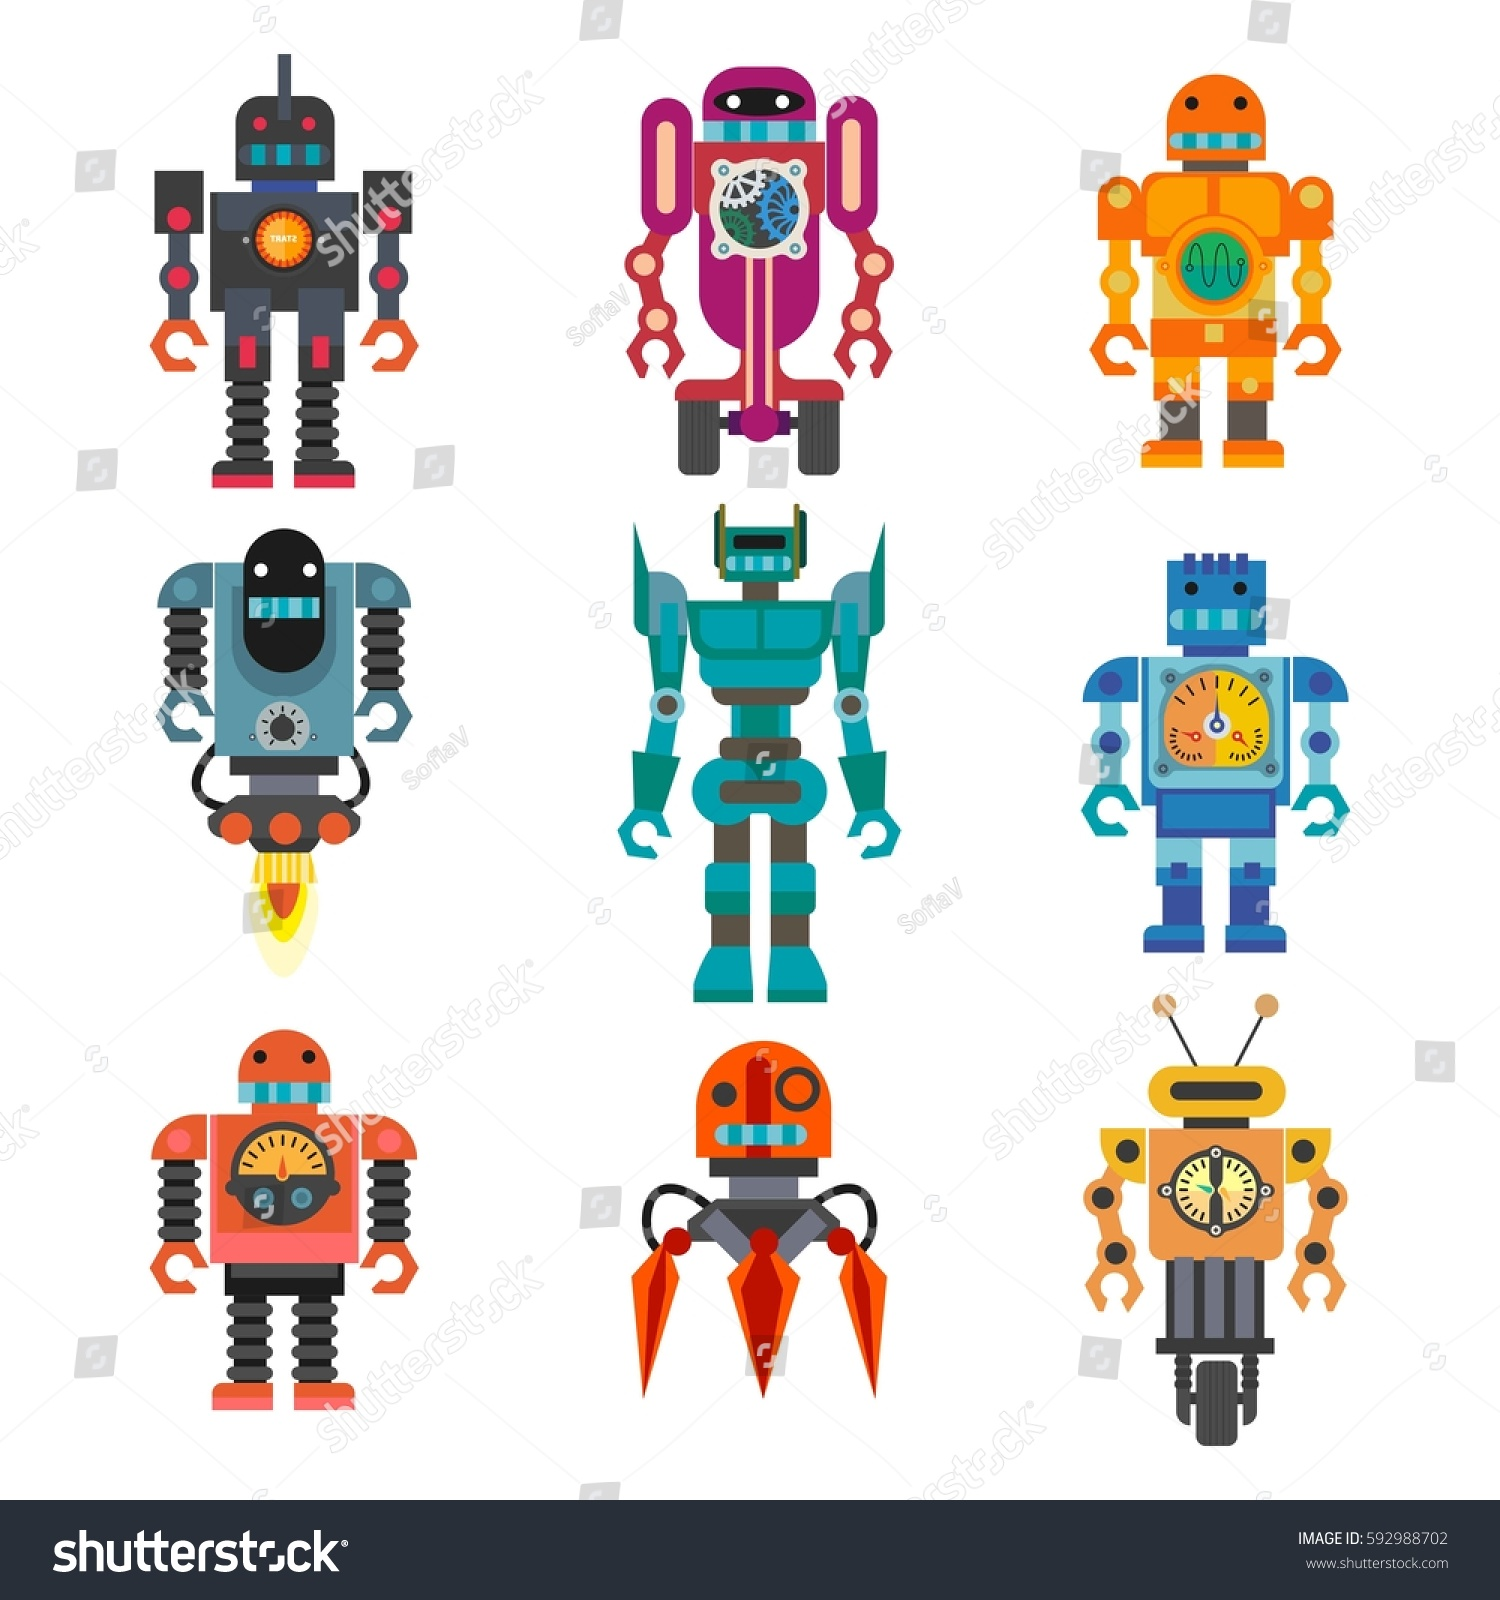 Cartoon Robot Toy : Robots transformer androids retro cartoon toys stock